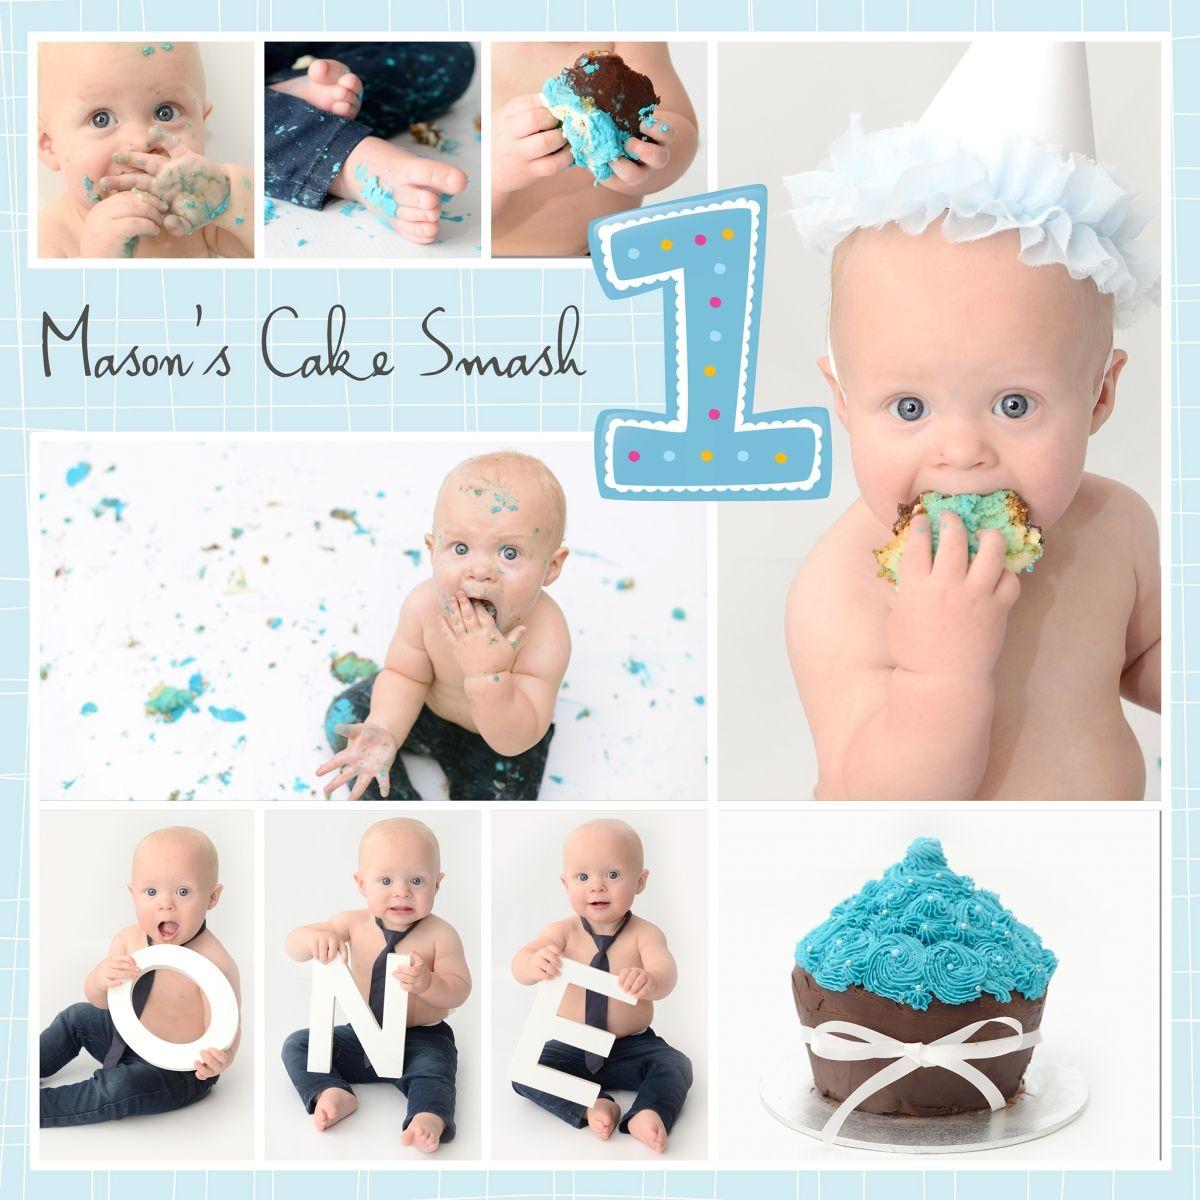 Milestone Blanket Ideas Milestone Baby Blanket Milestone Blanket Pictures Monthly Milestone B Baby Milestones Pictures Baby Milestone Blanket Milestone Blanket